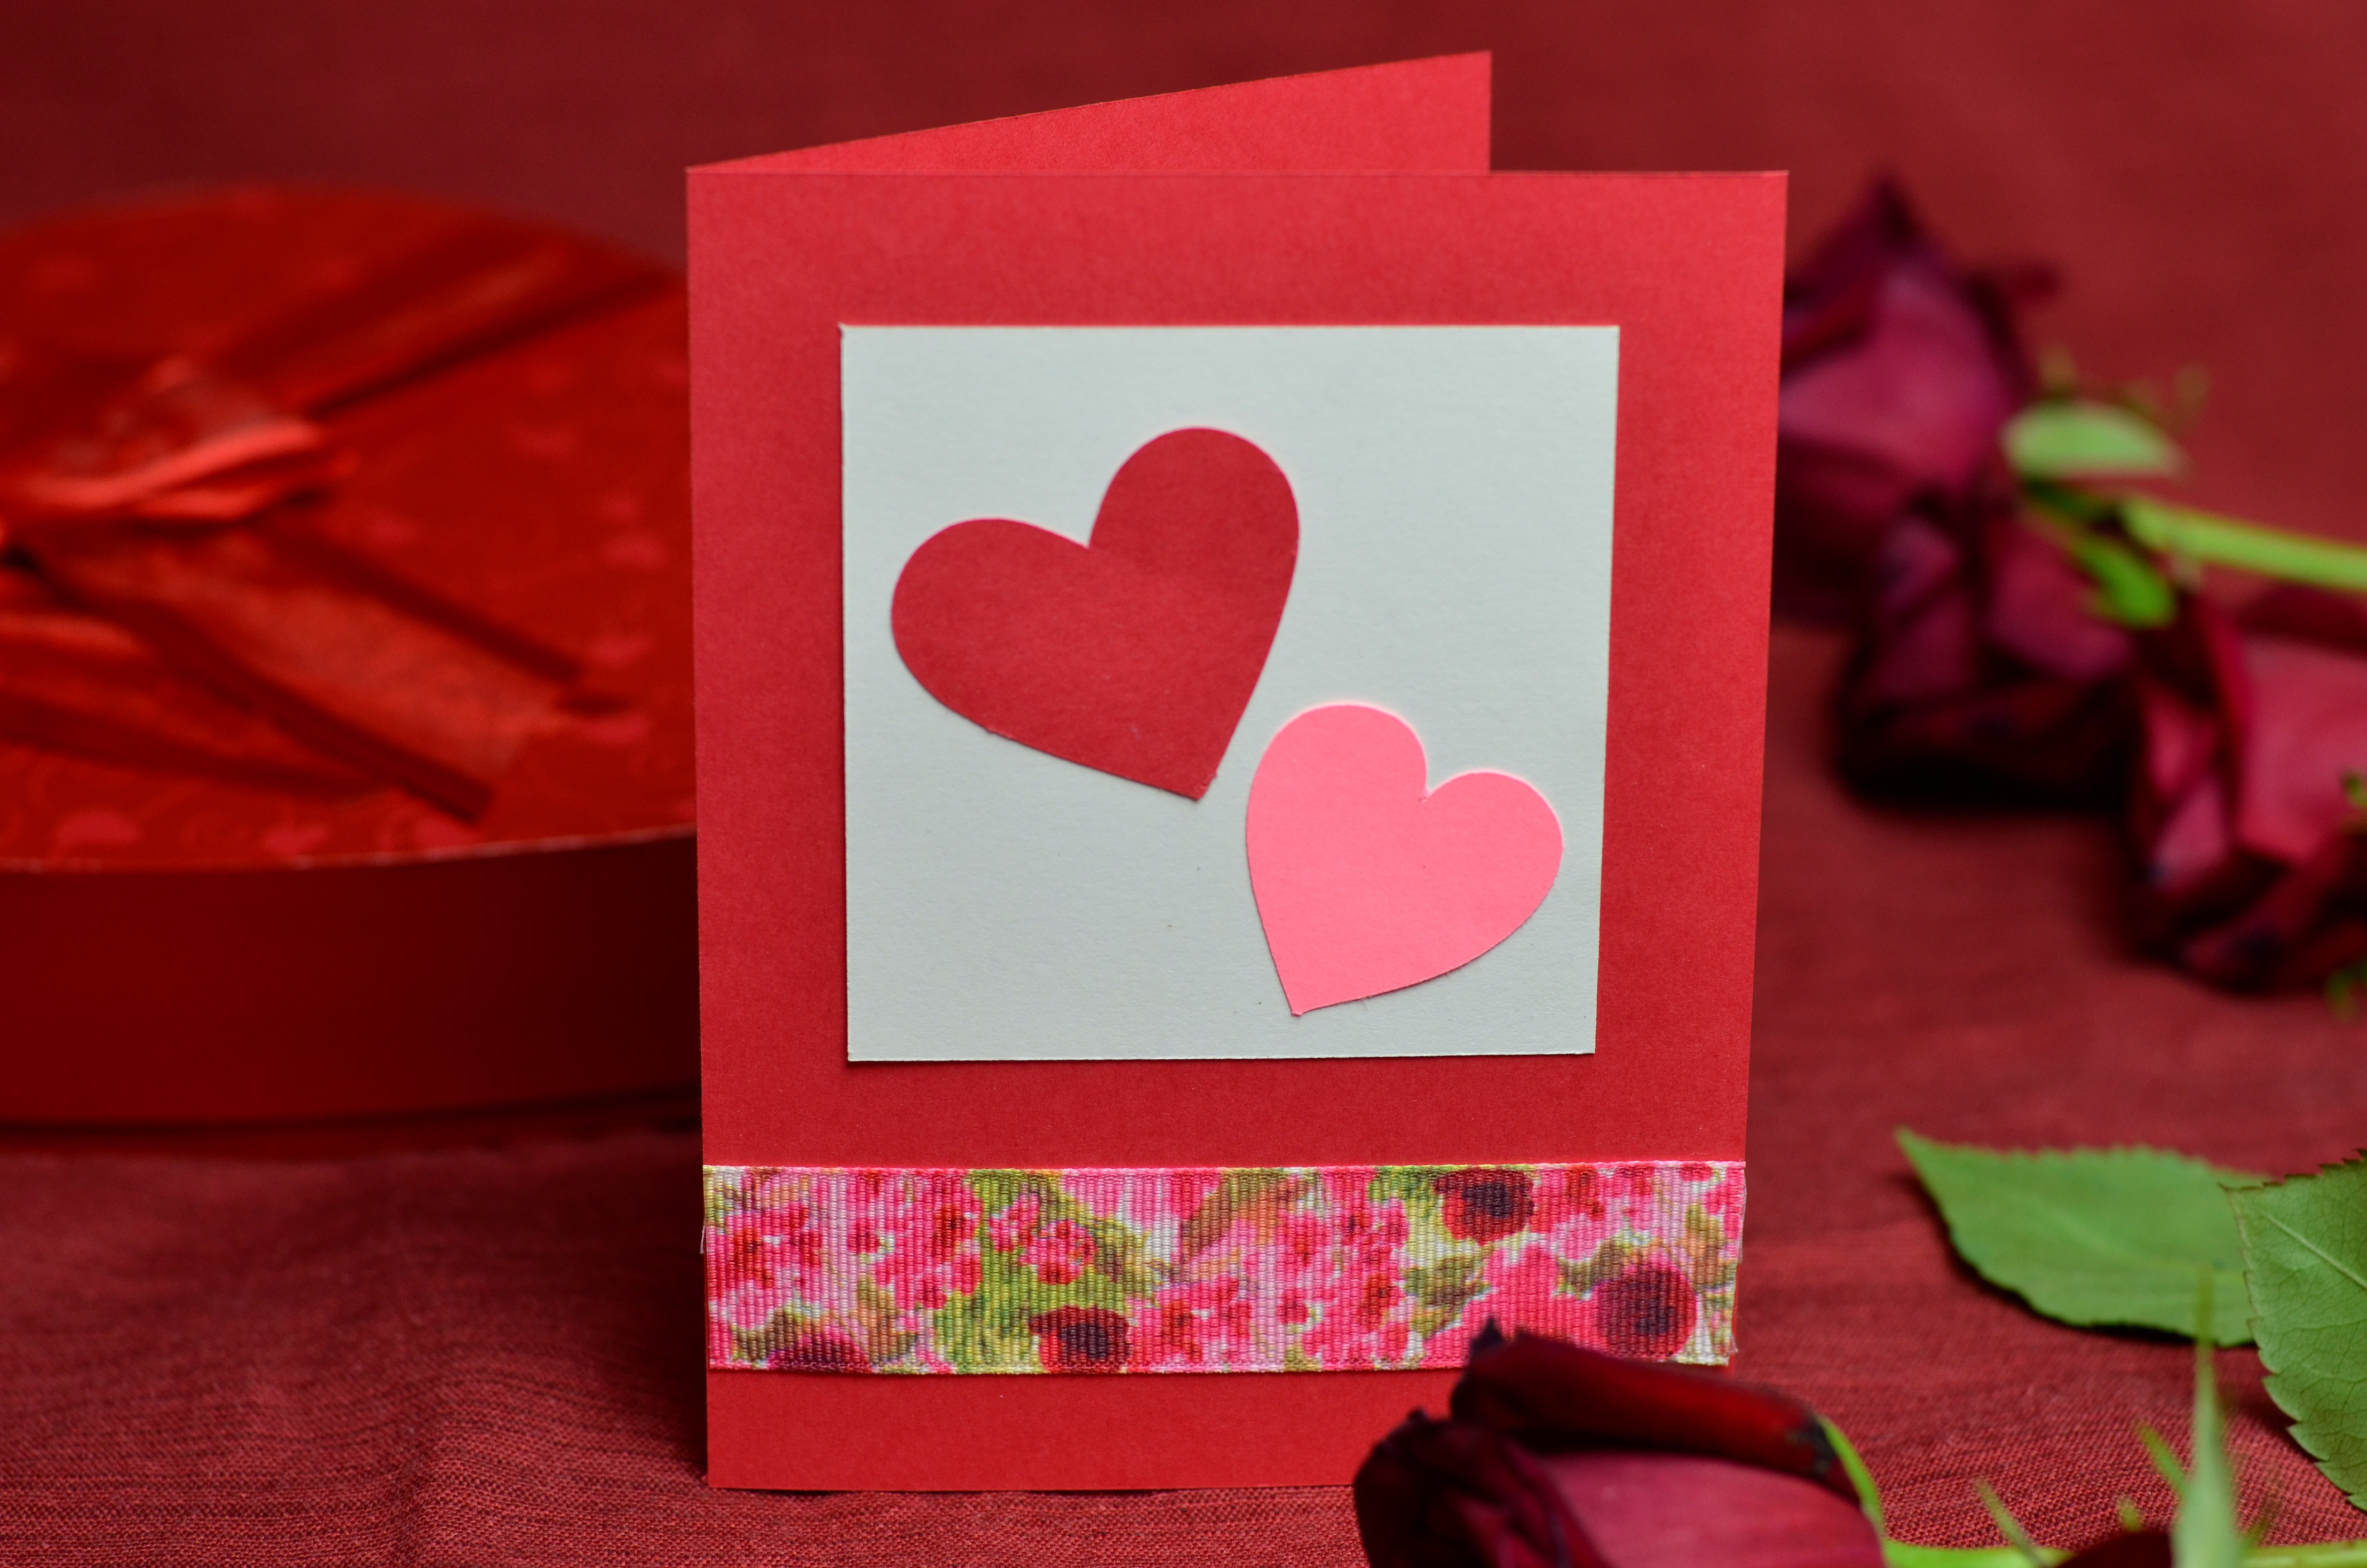 Валентинки своими руками - из бумаги, фетра, конфет - мастер класс с фото и шаблонами - видео уроки